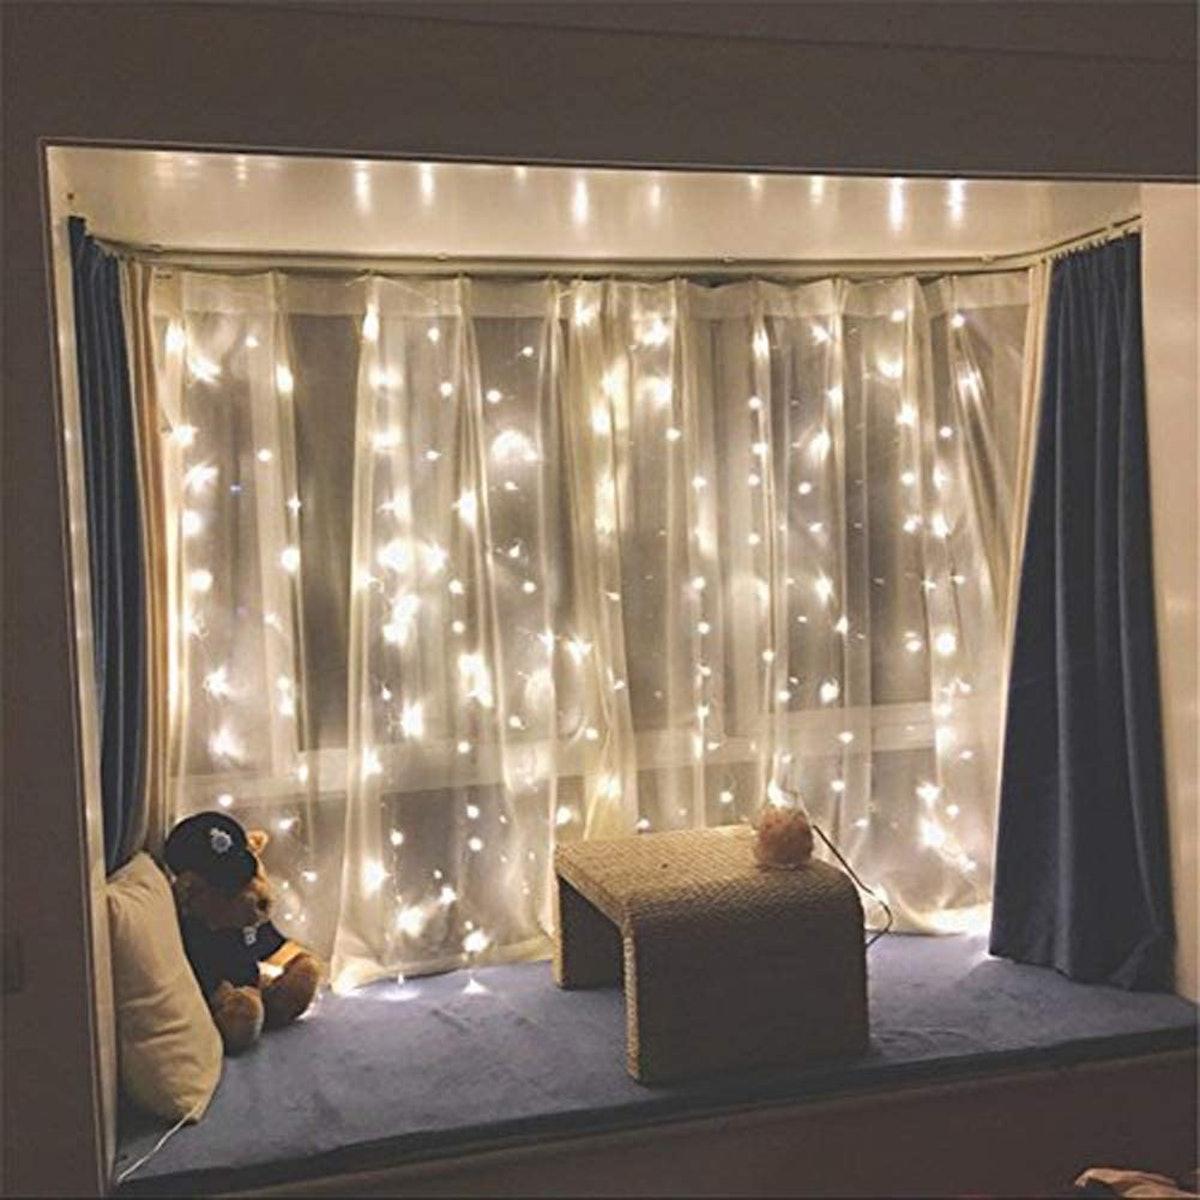 Twinkle Star LED Window Curtain String Lights